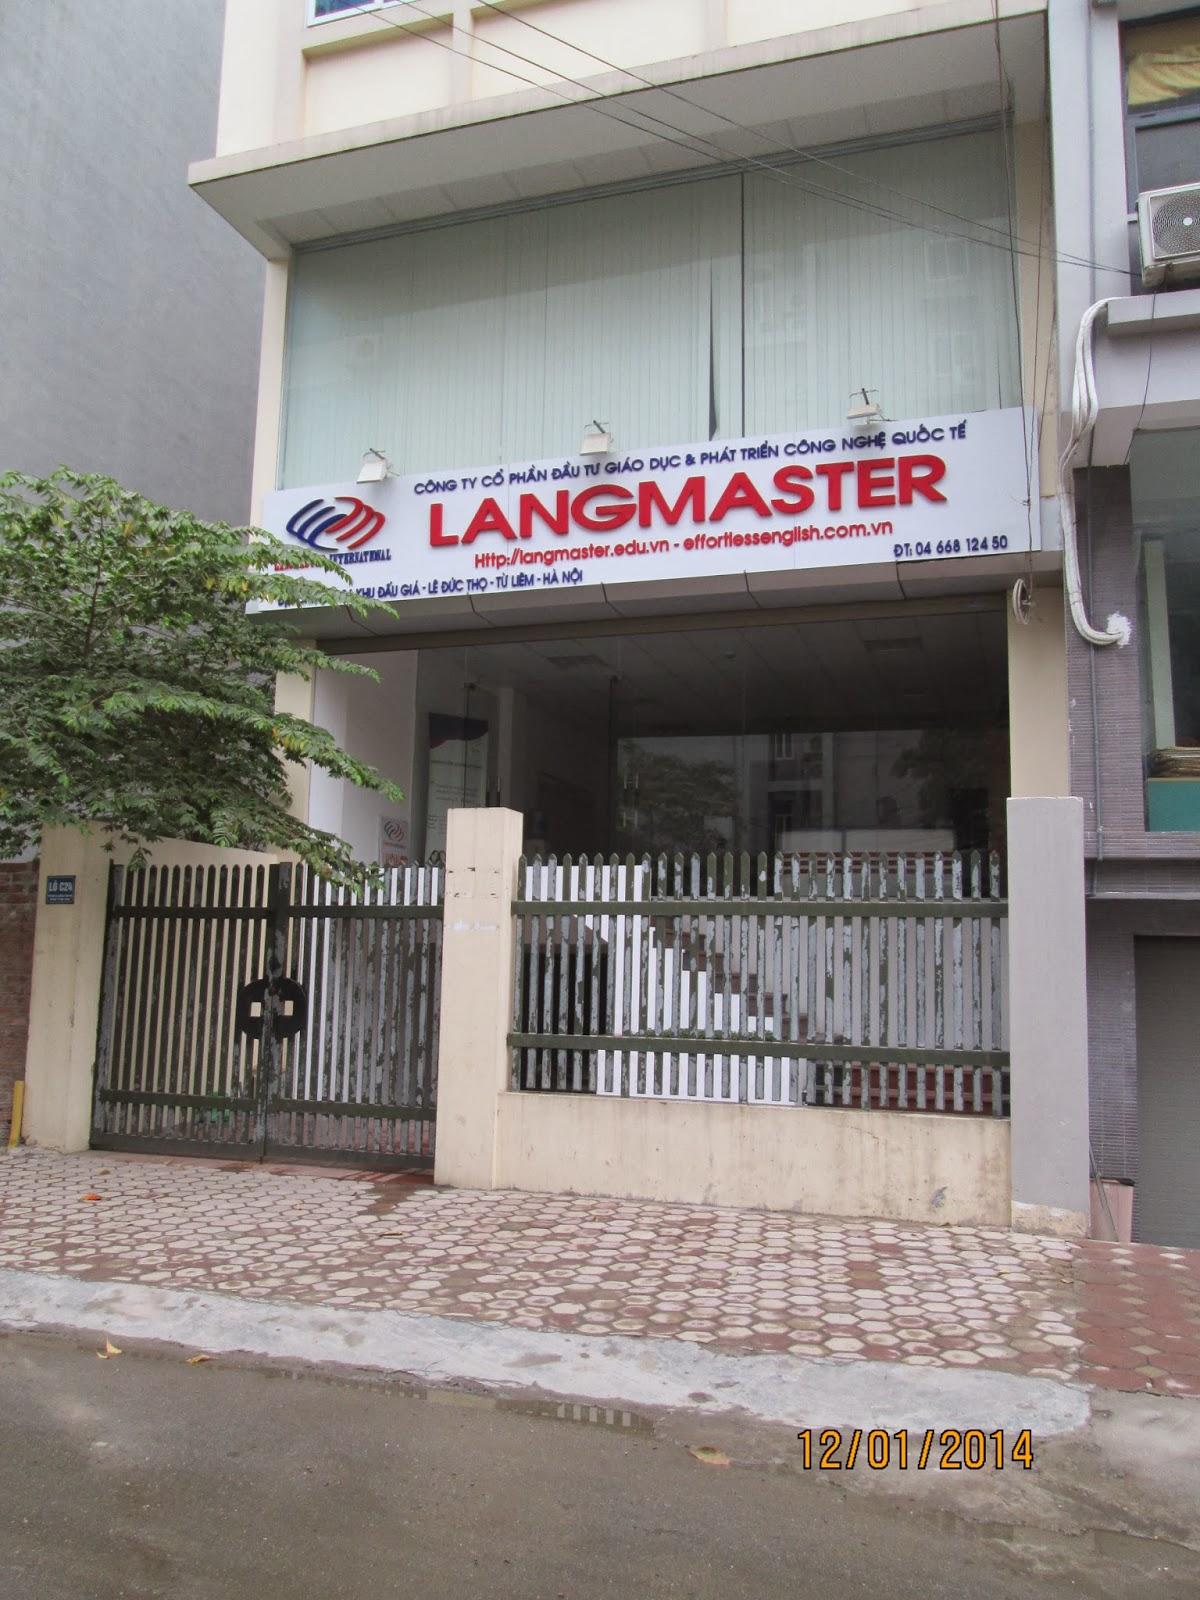 Câu lạc bộ tiếng Anh Langmaster